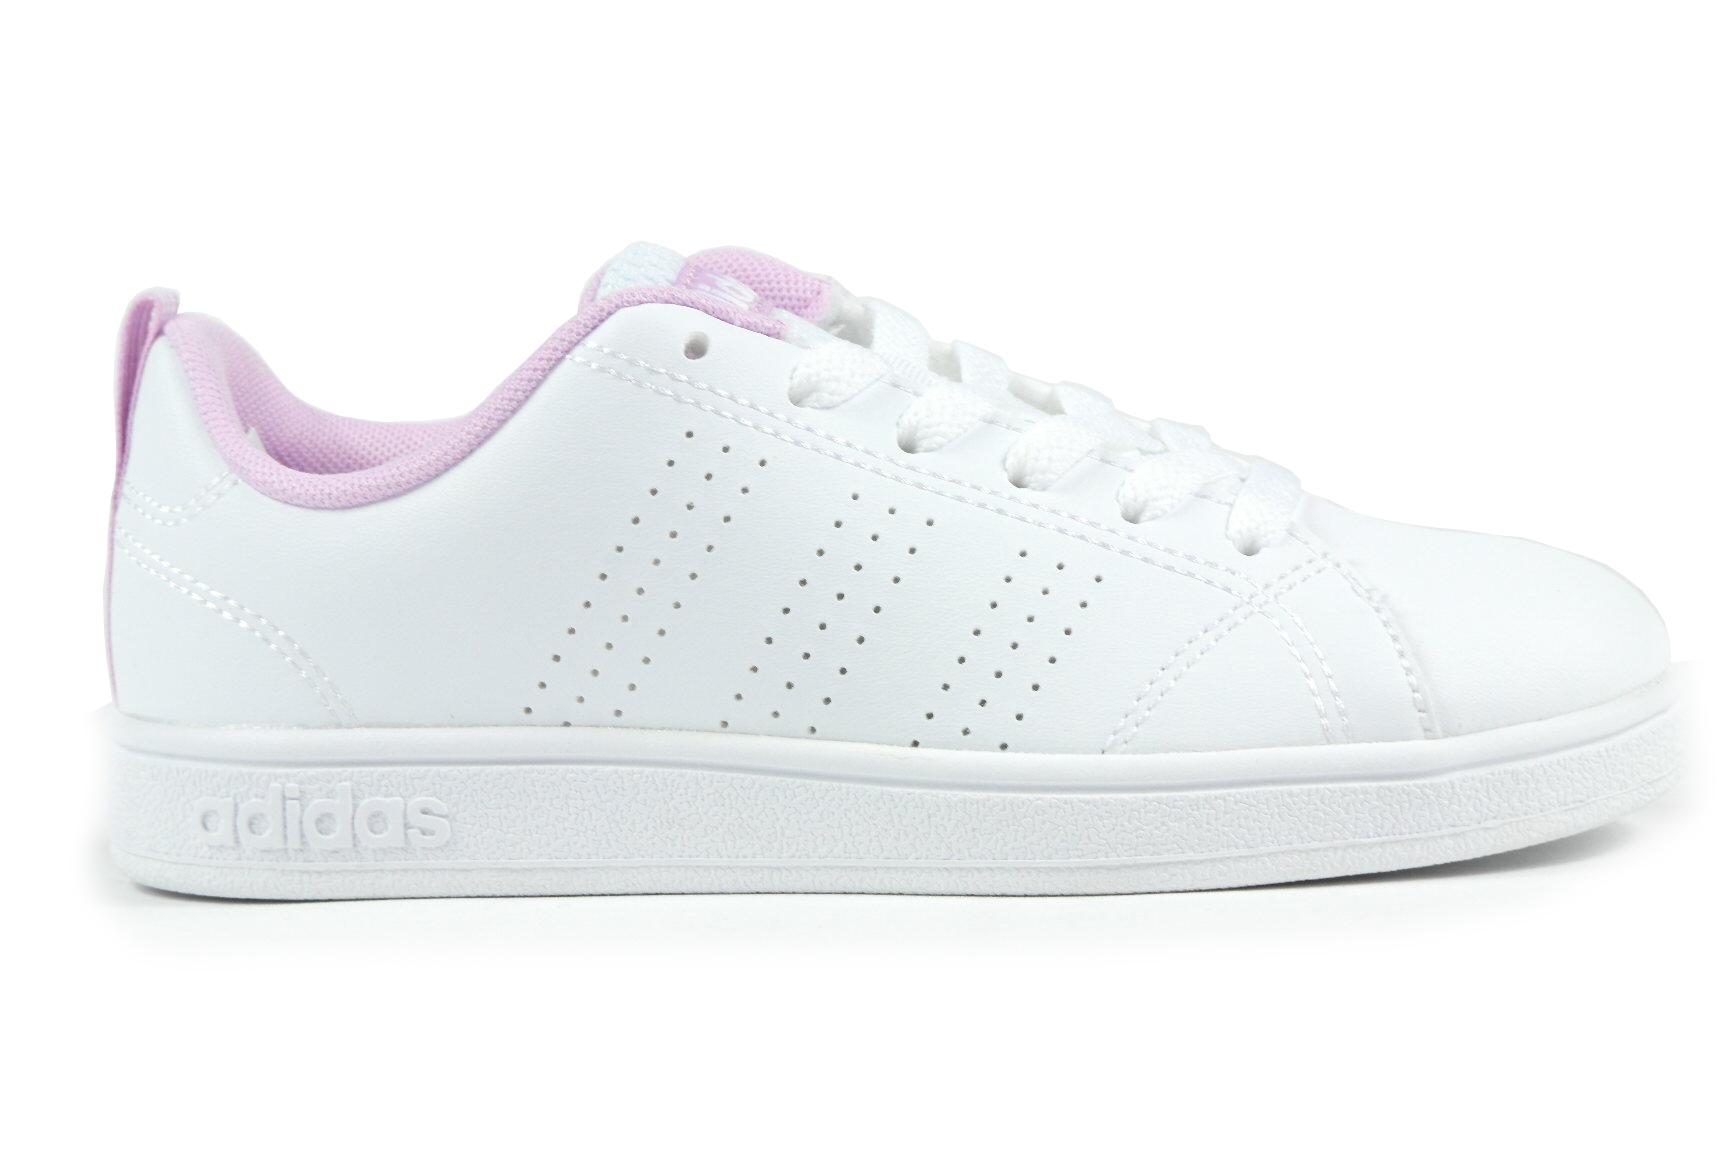 Adidas Advantage Clean Junior tennisschoenen